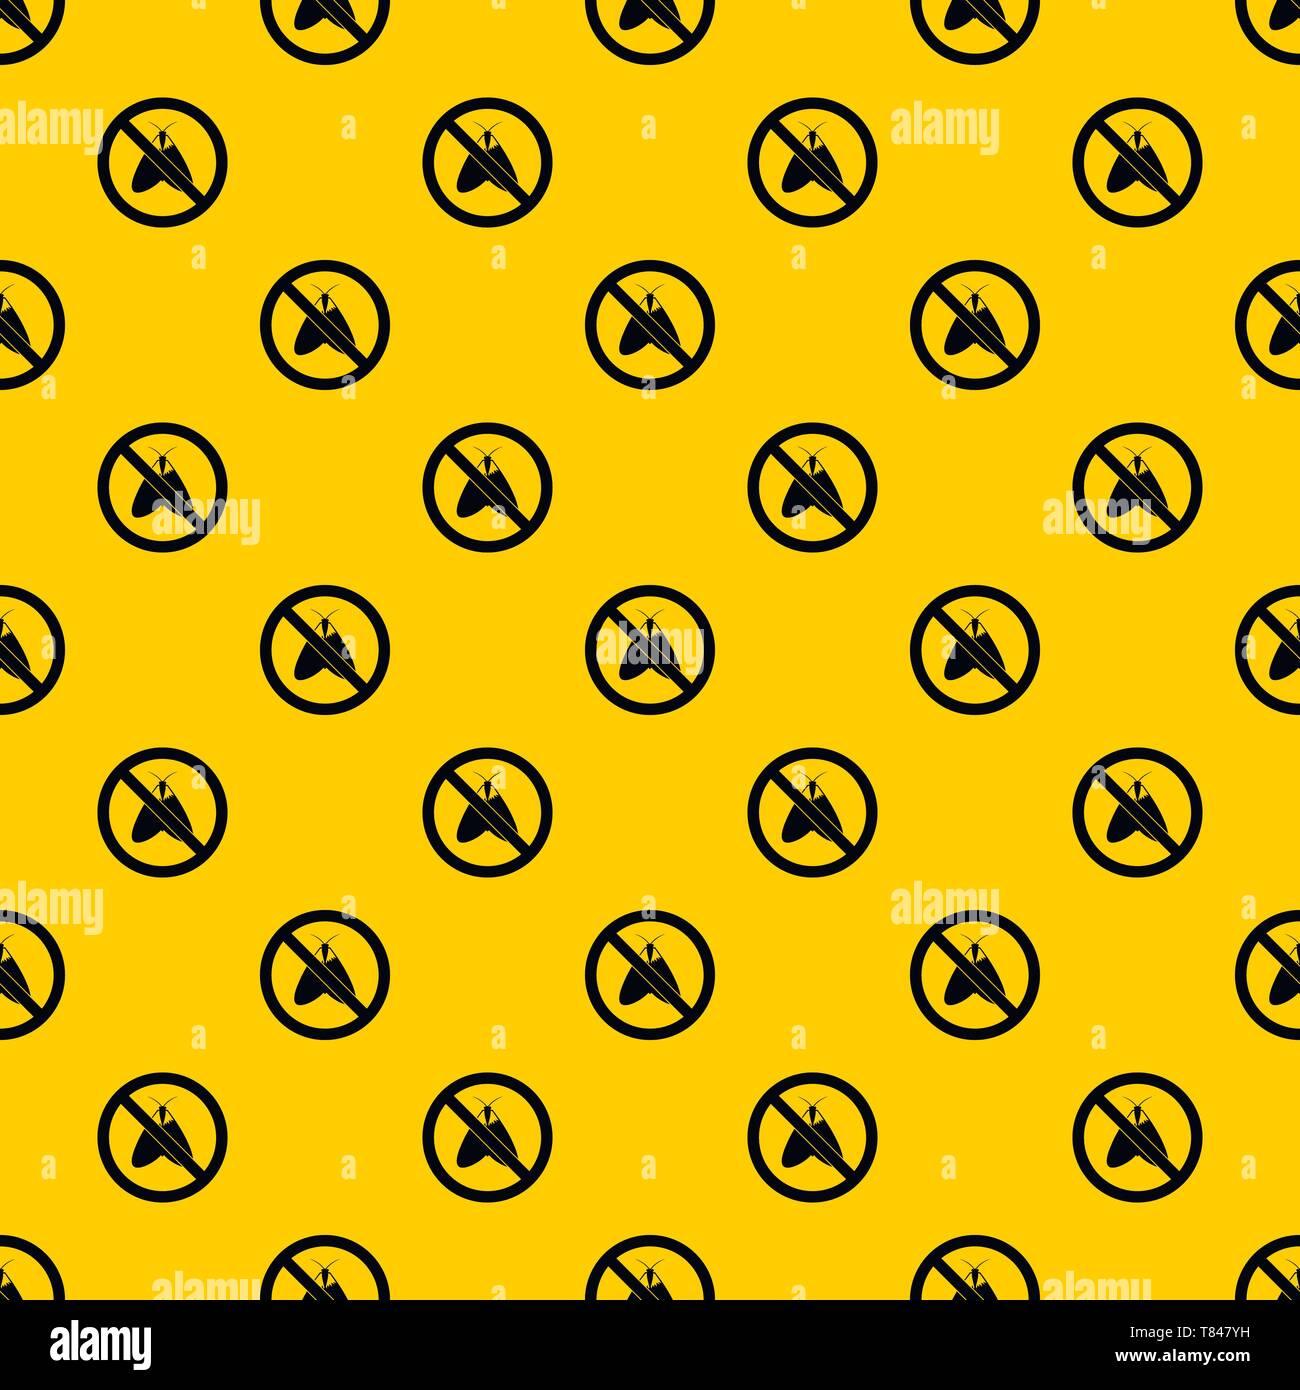 No moth sign pattern vector - Stock Image